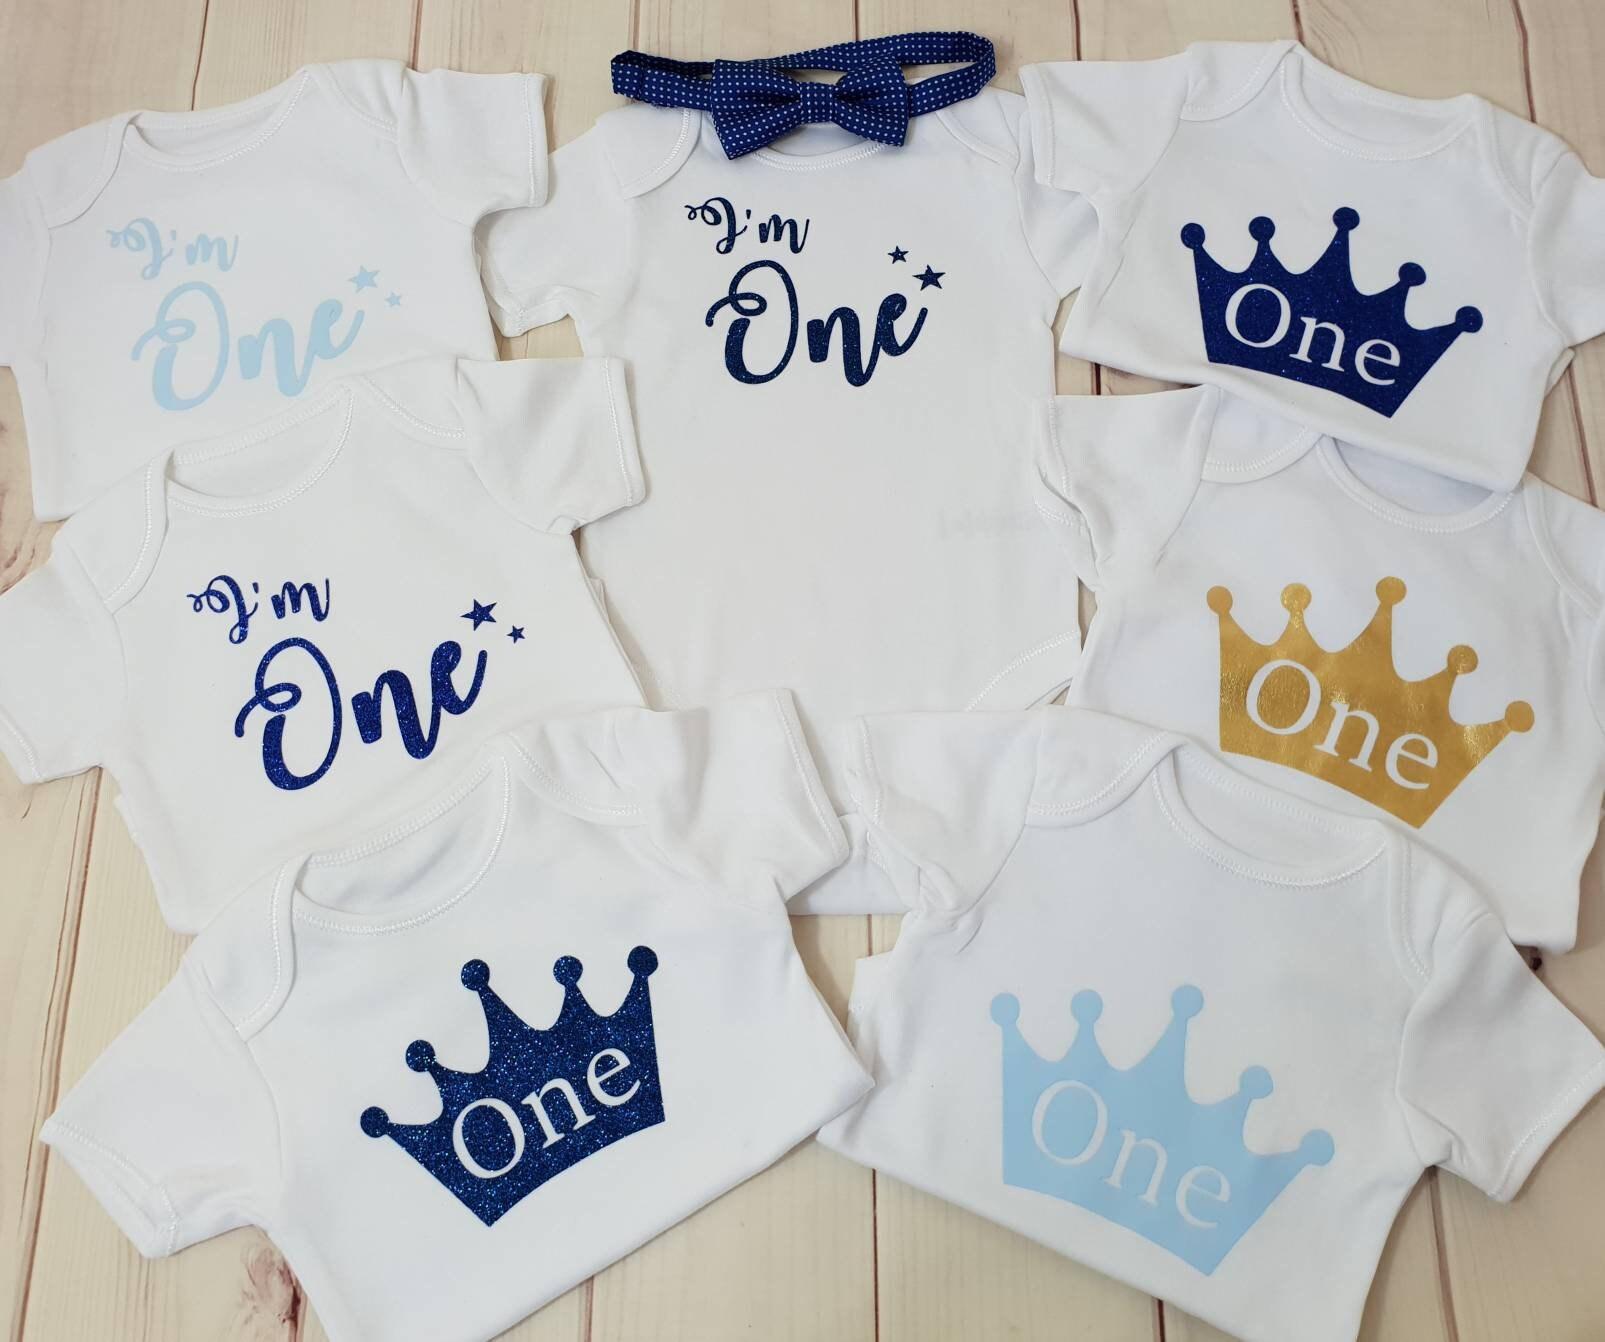 a35de19b9 I'm one baby boy 1st birthday outfit bodysuit vest top | Etsy